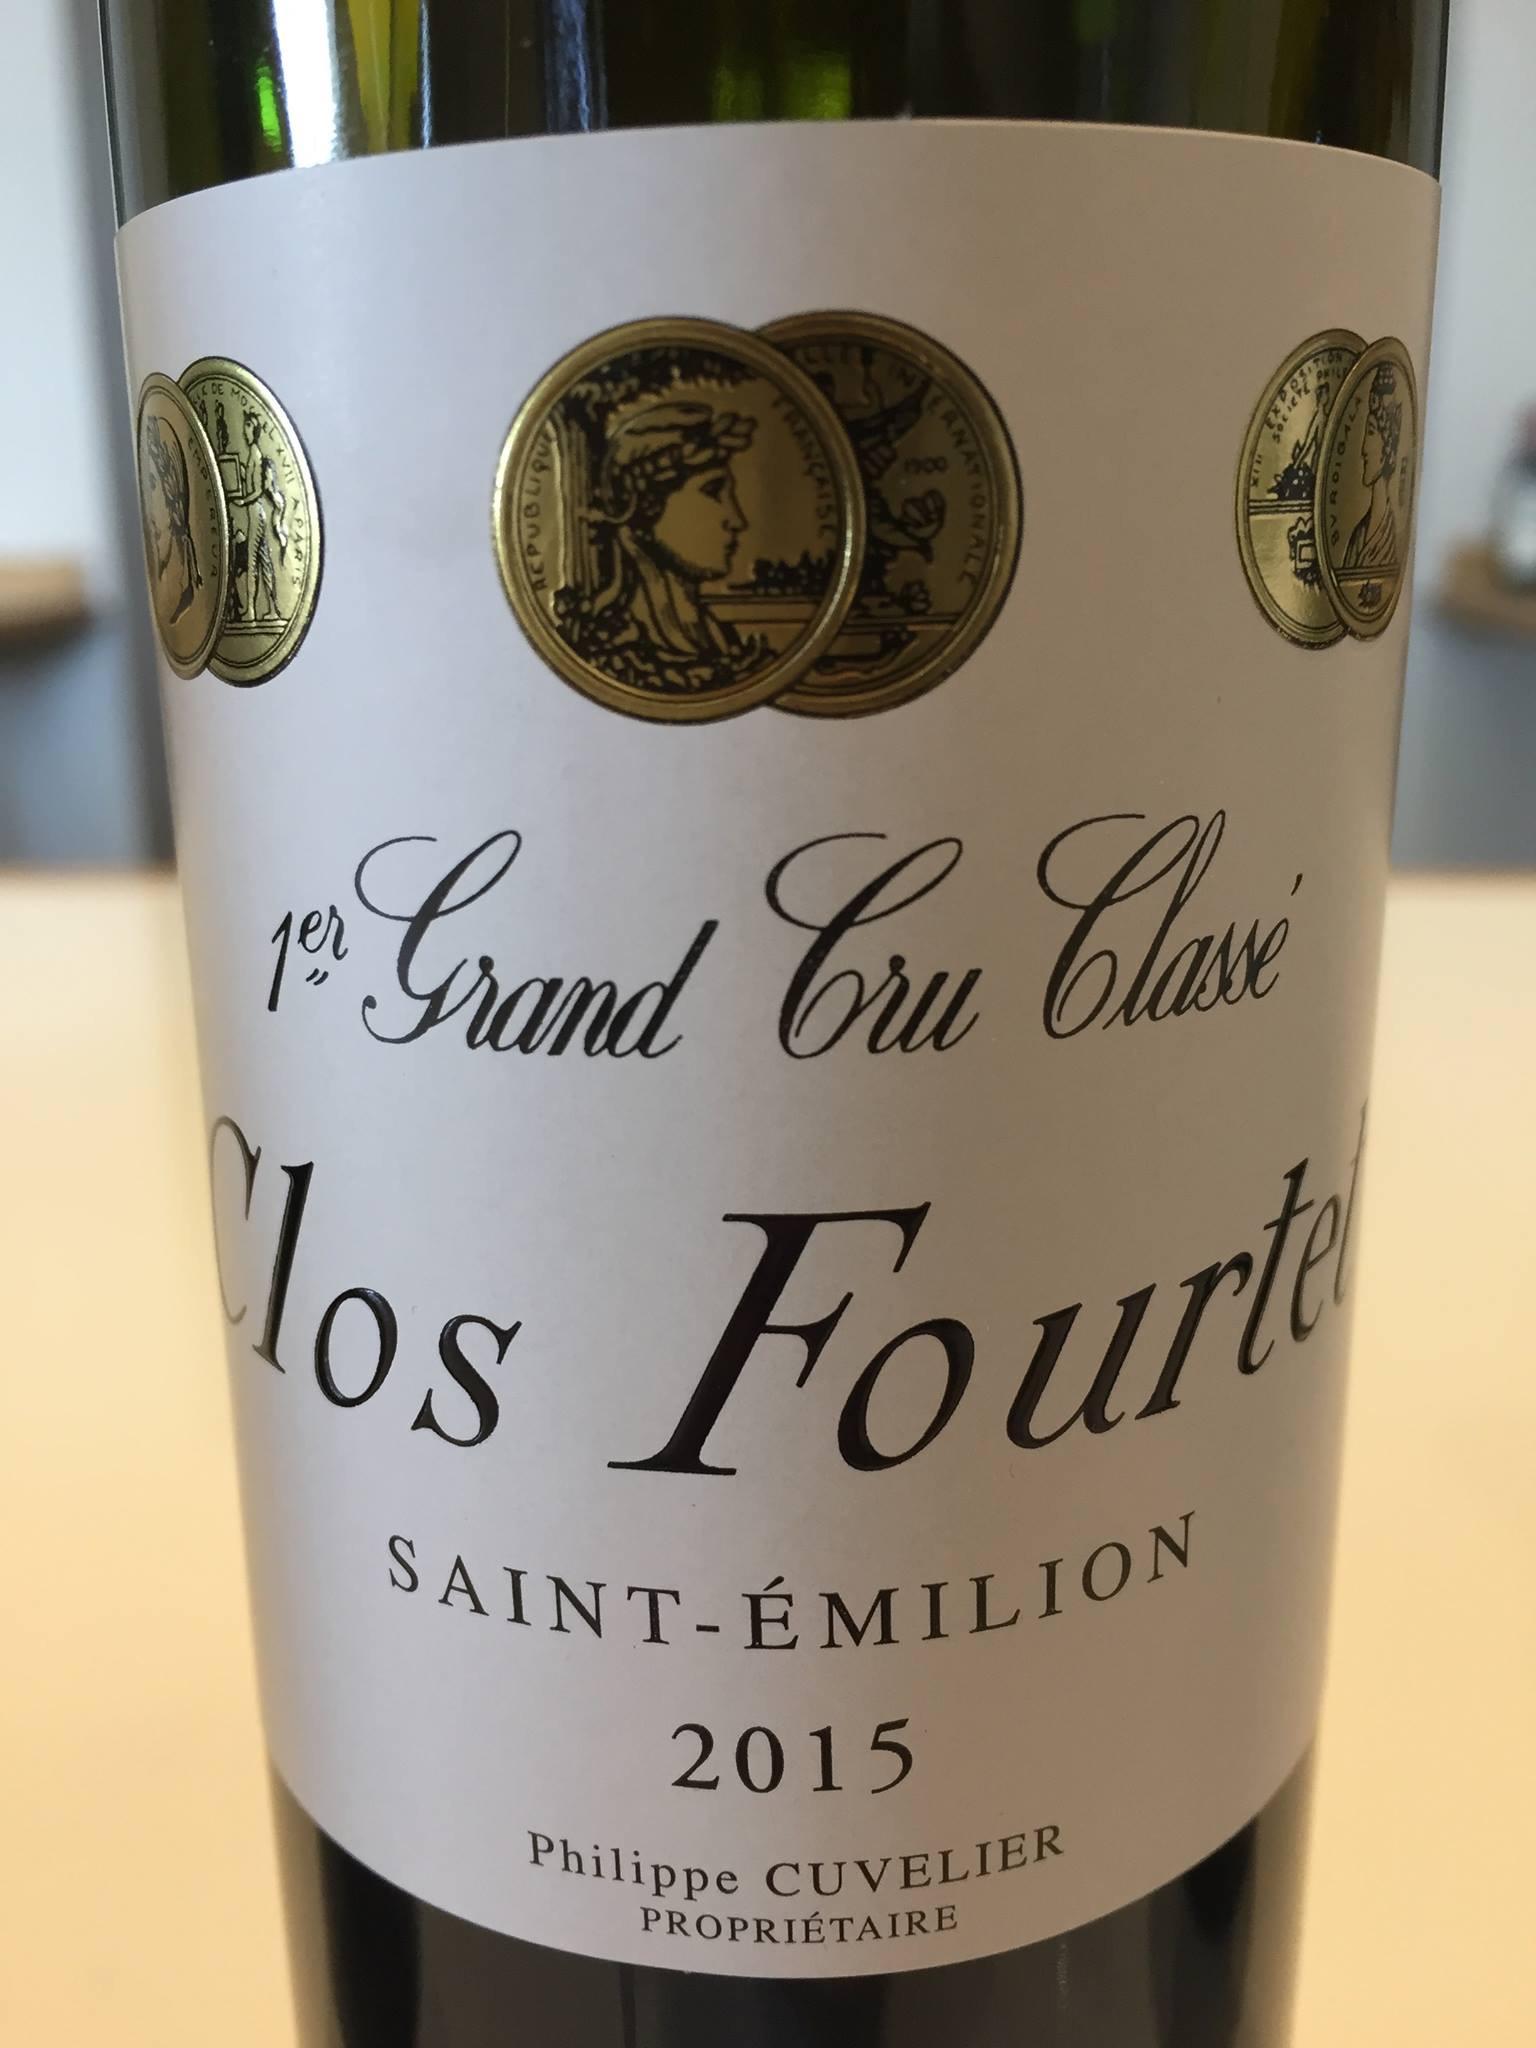 Clos Fourtet 2015 – Saint-Emilion 1er Grand Cru Classé B